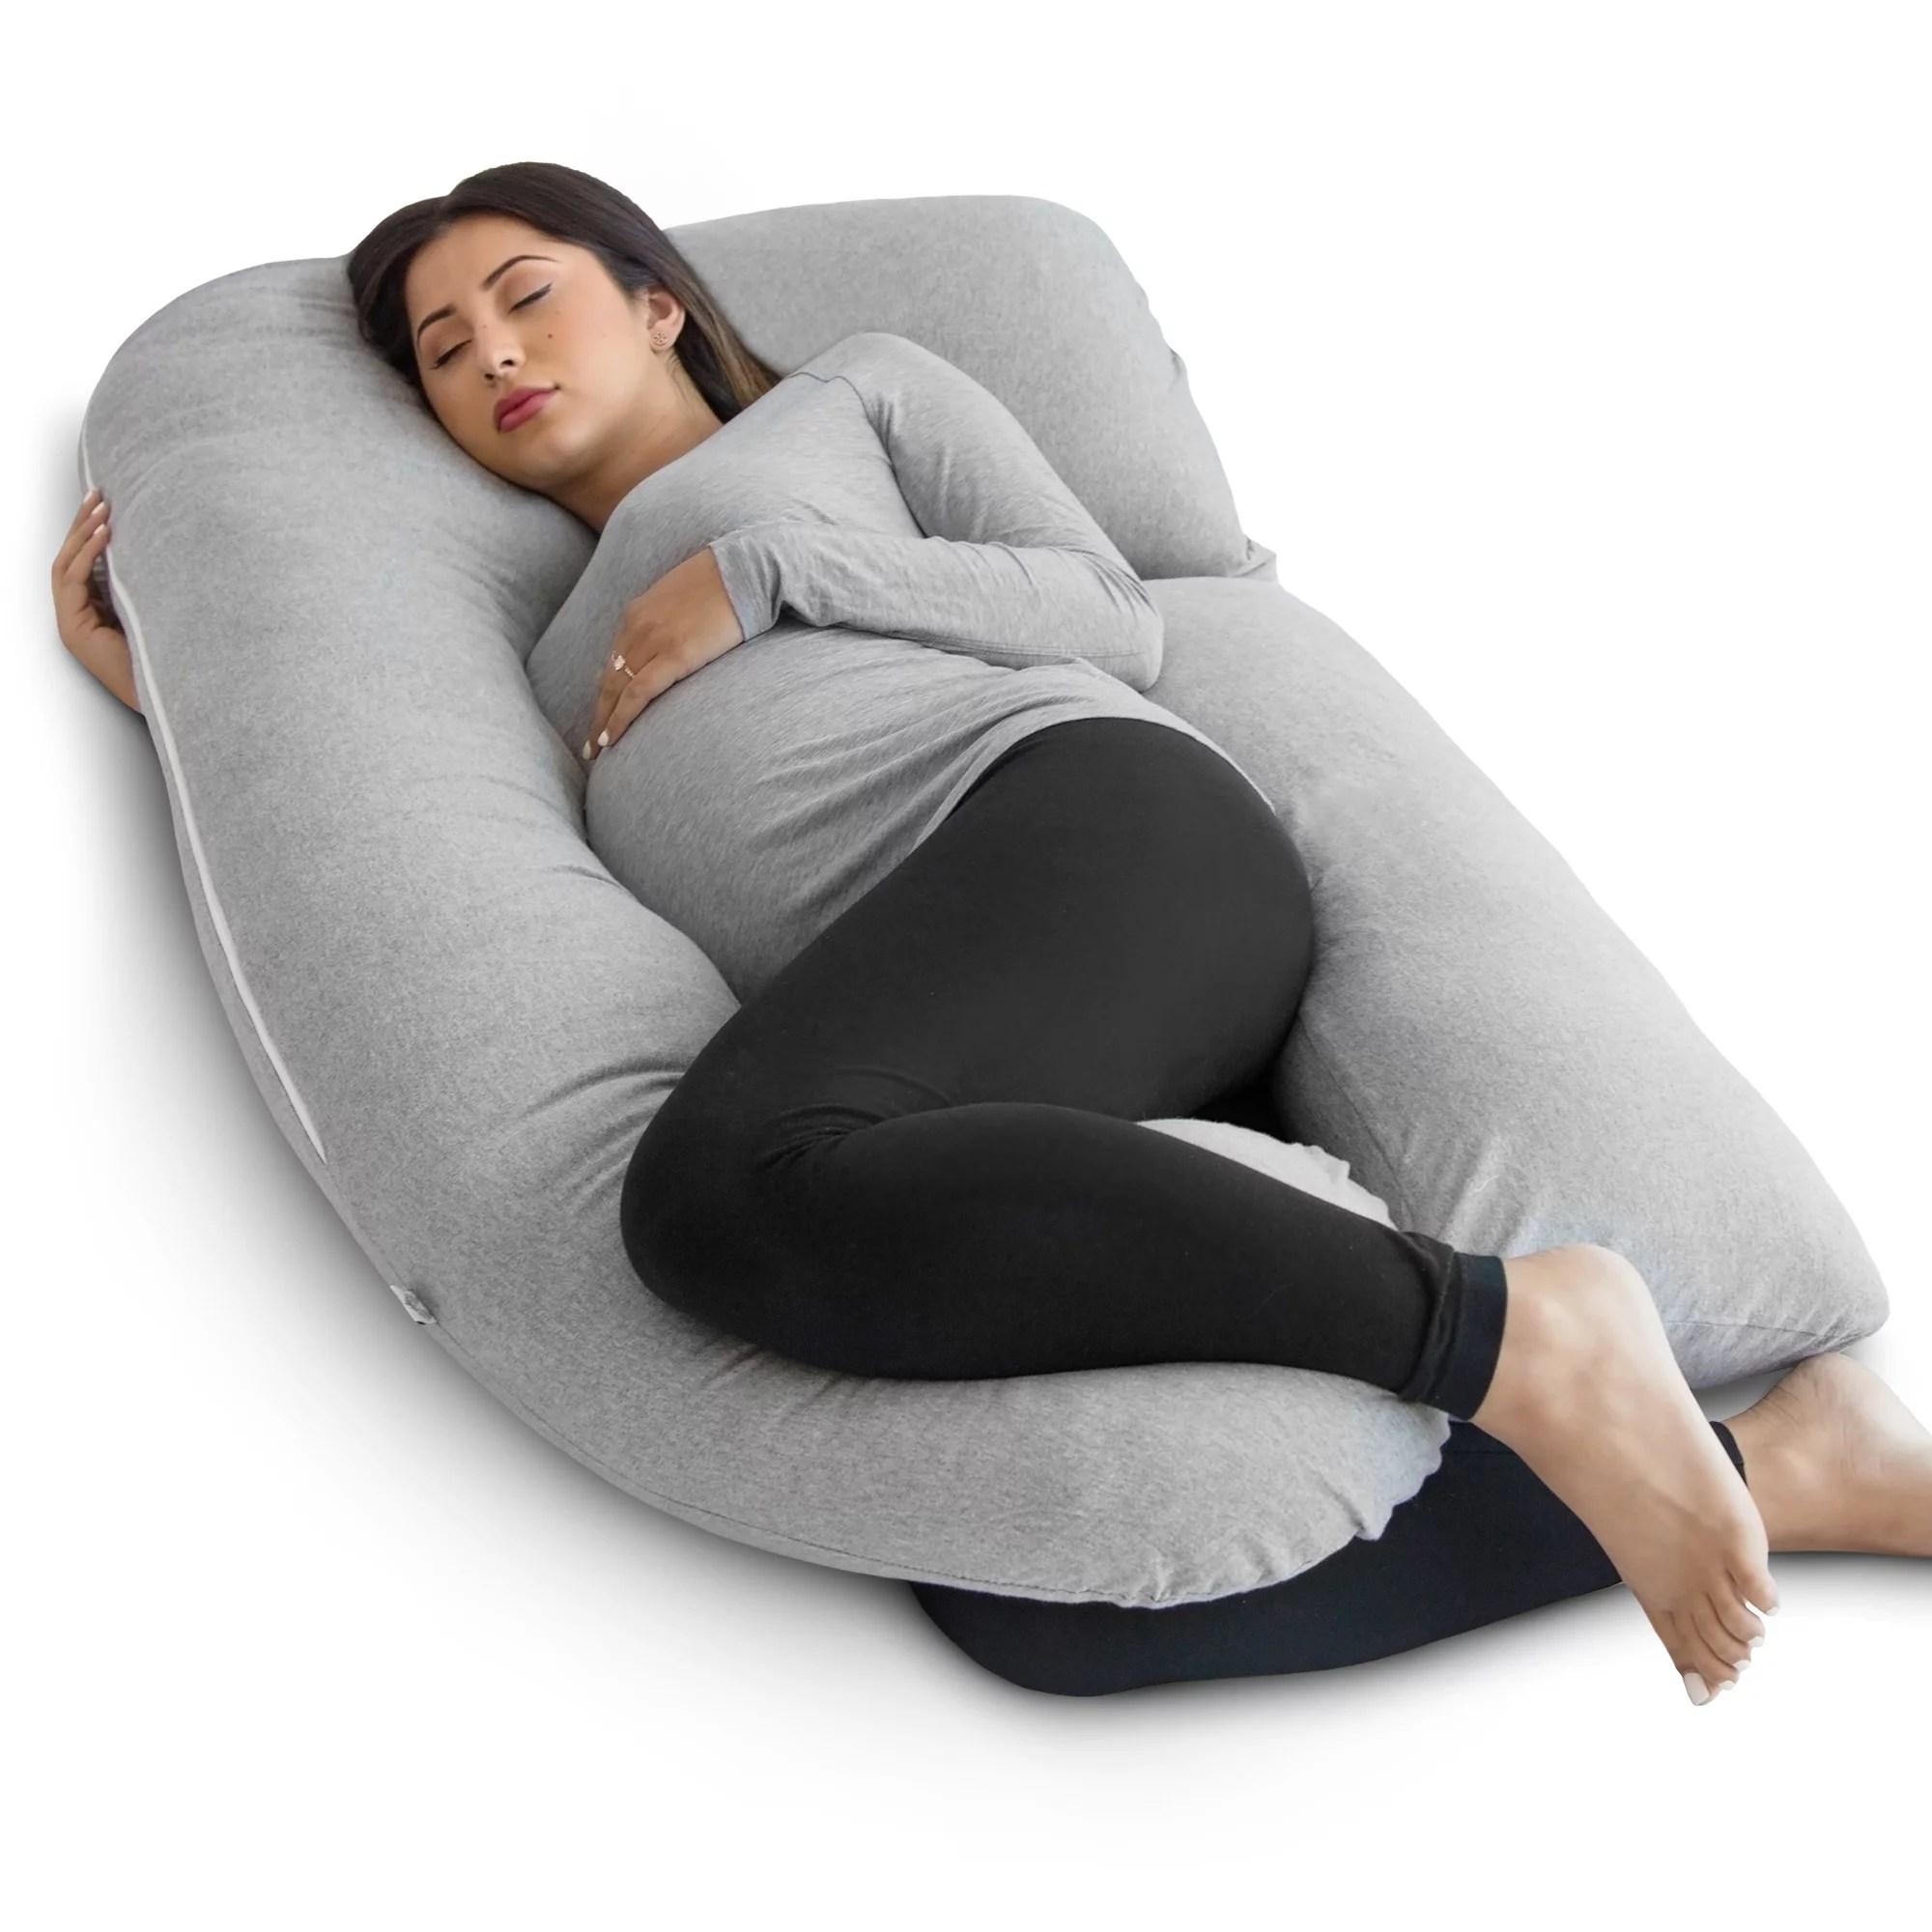 pharmedoc full body pregnancy pillow pregnant women w detachable extension grey walmart com